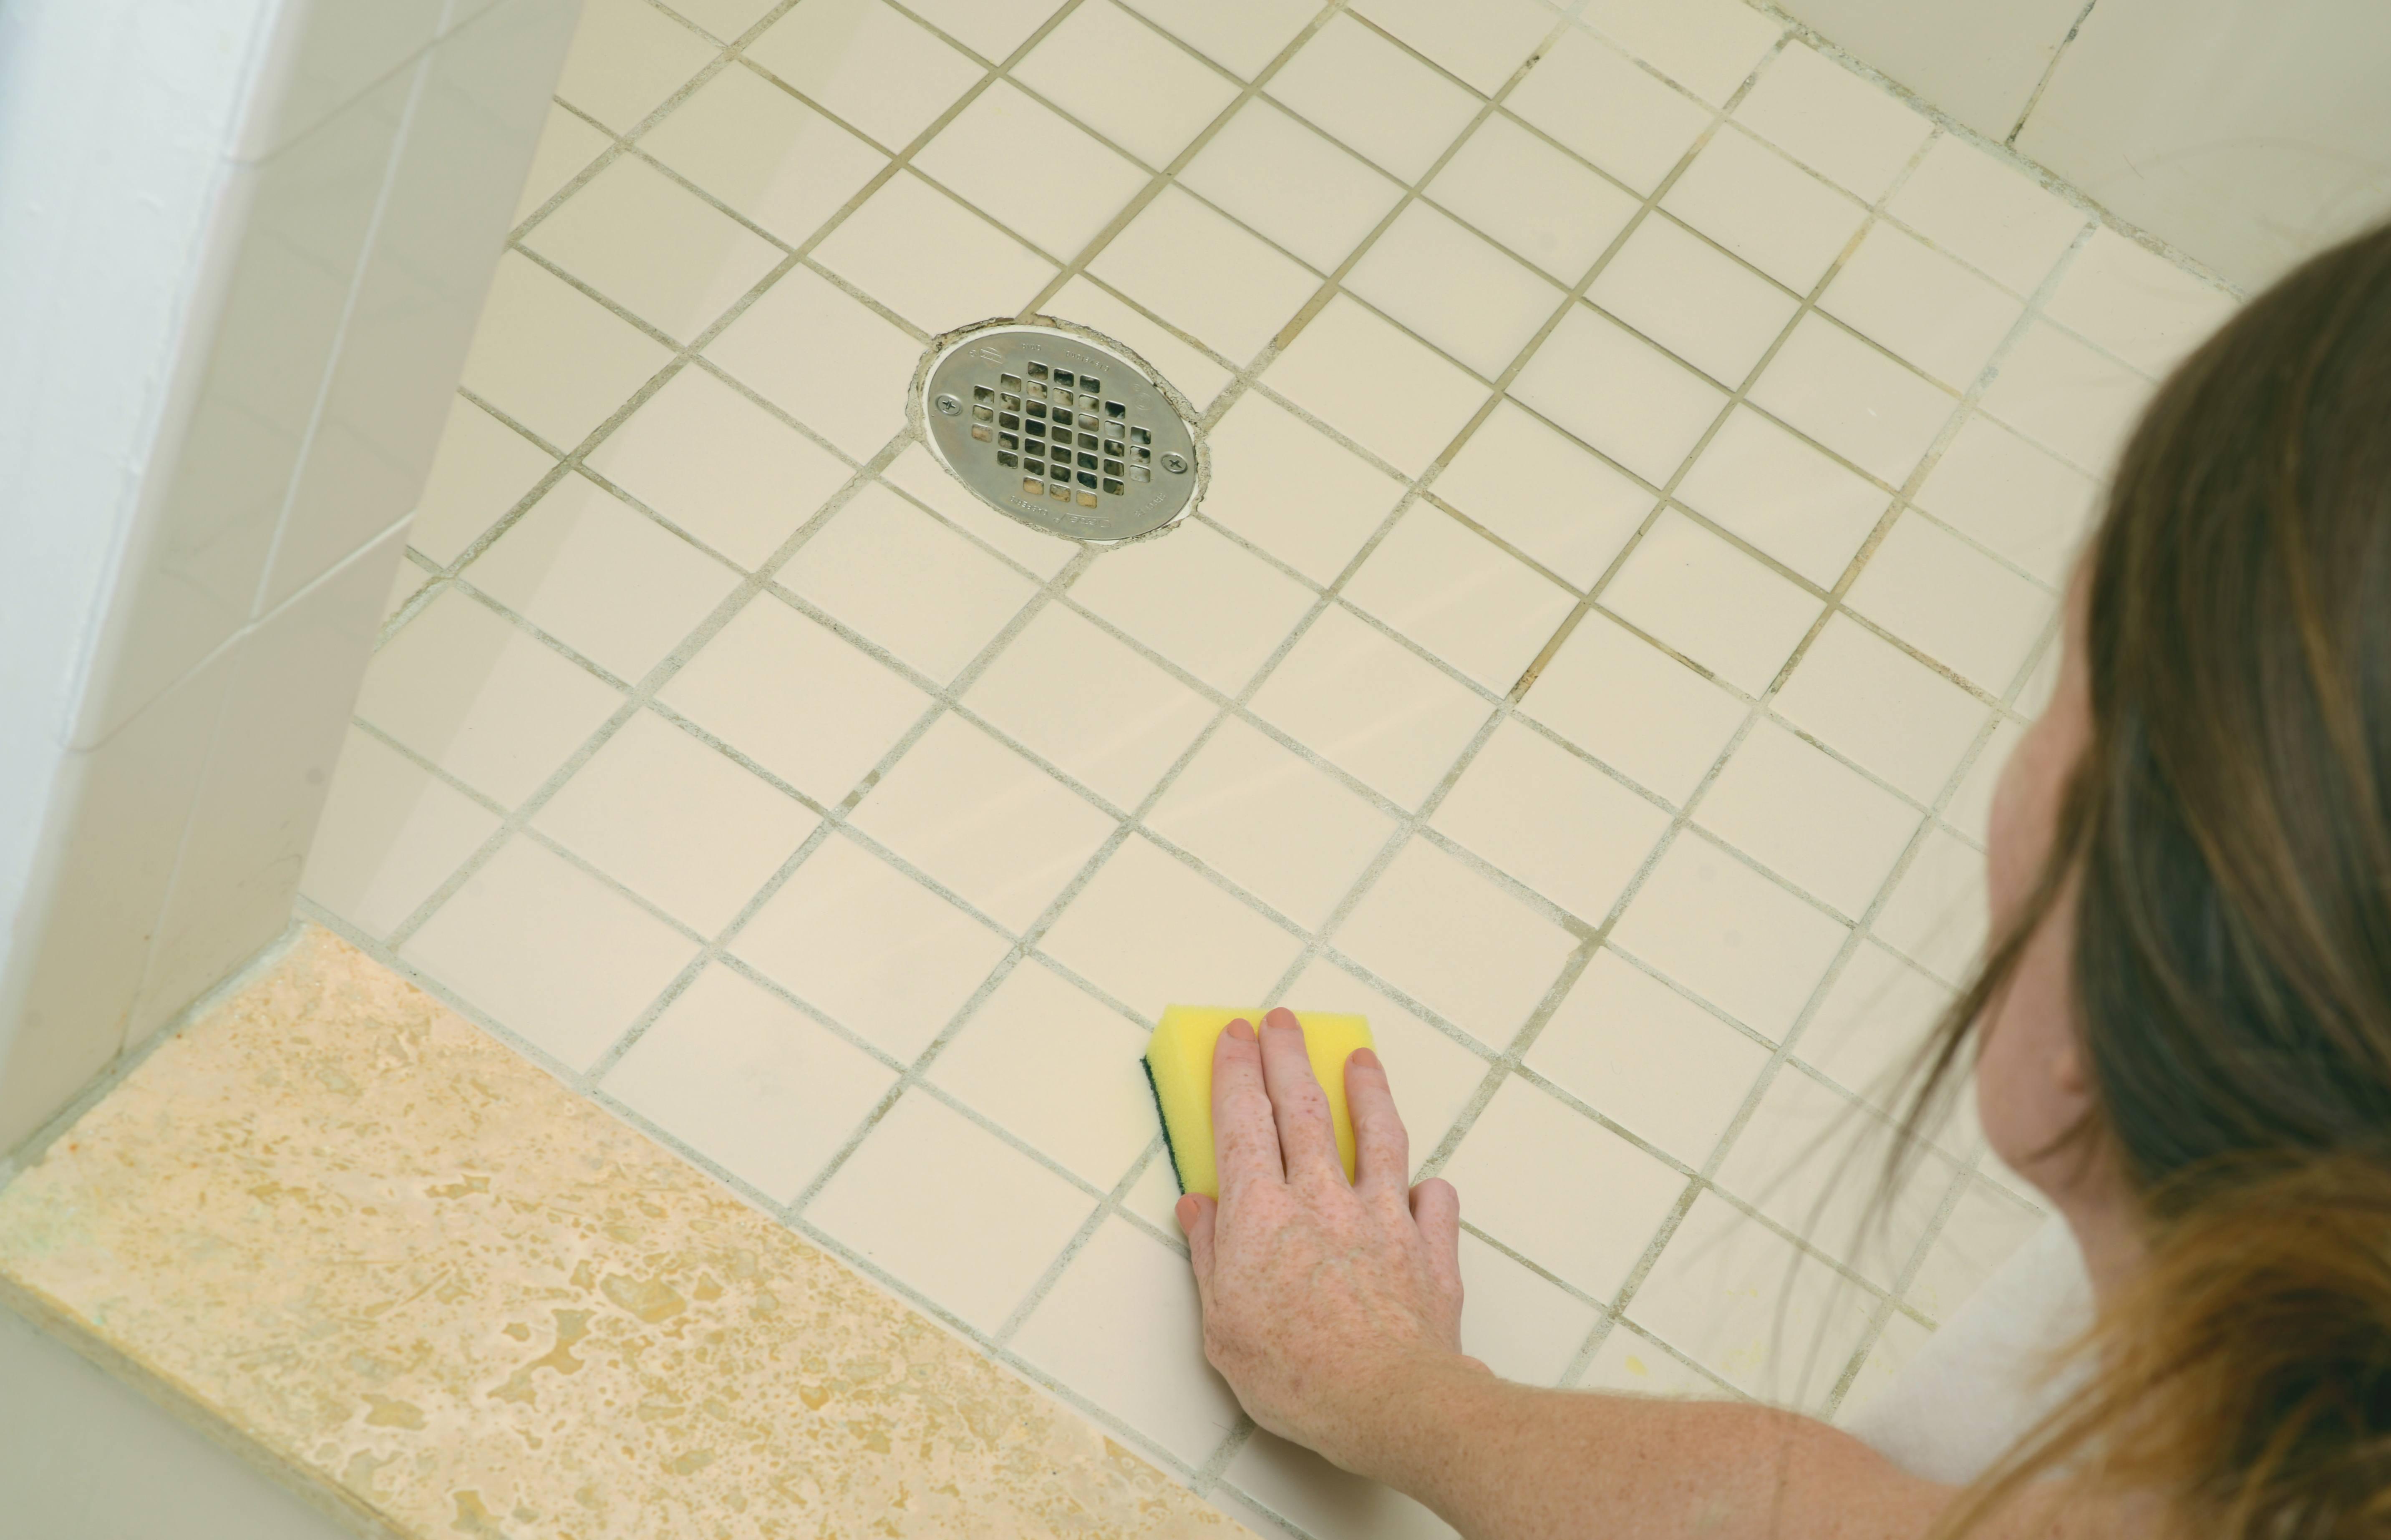 Schimmel im Badezimmer bekämpfen - innotech GmbH